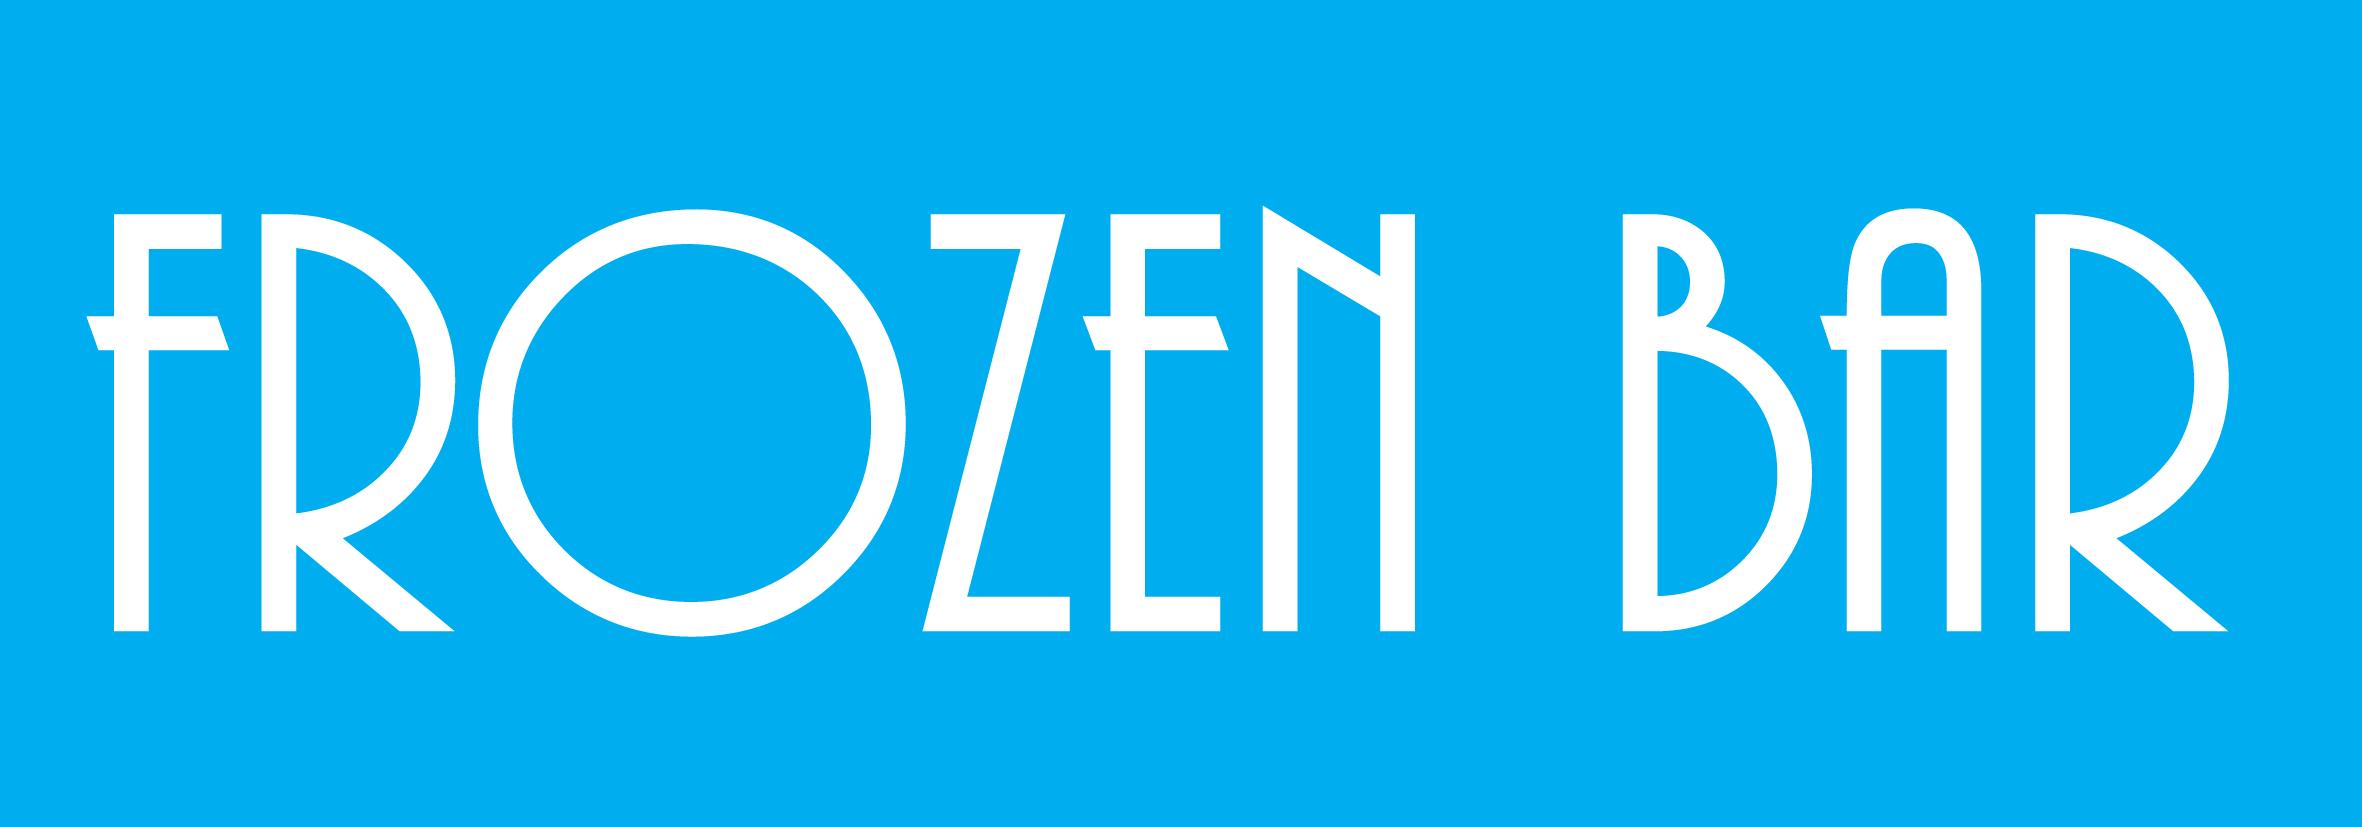 Frozenbar.gr – Εξοπλισμοί καταστημάτων